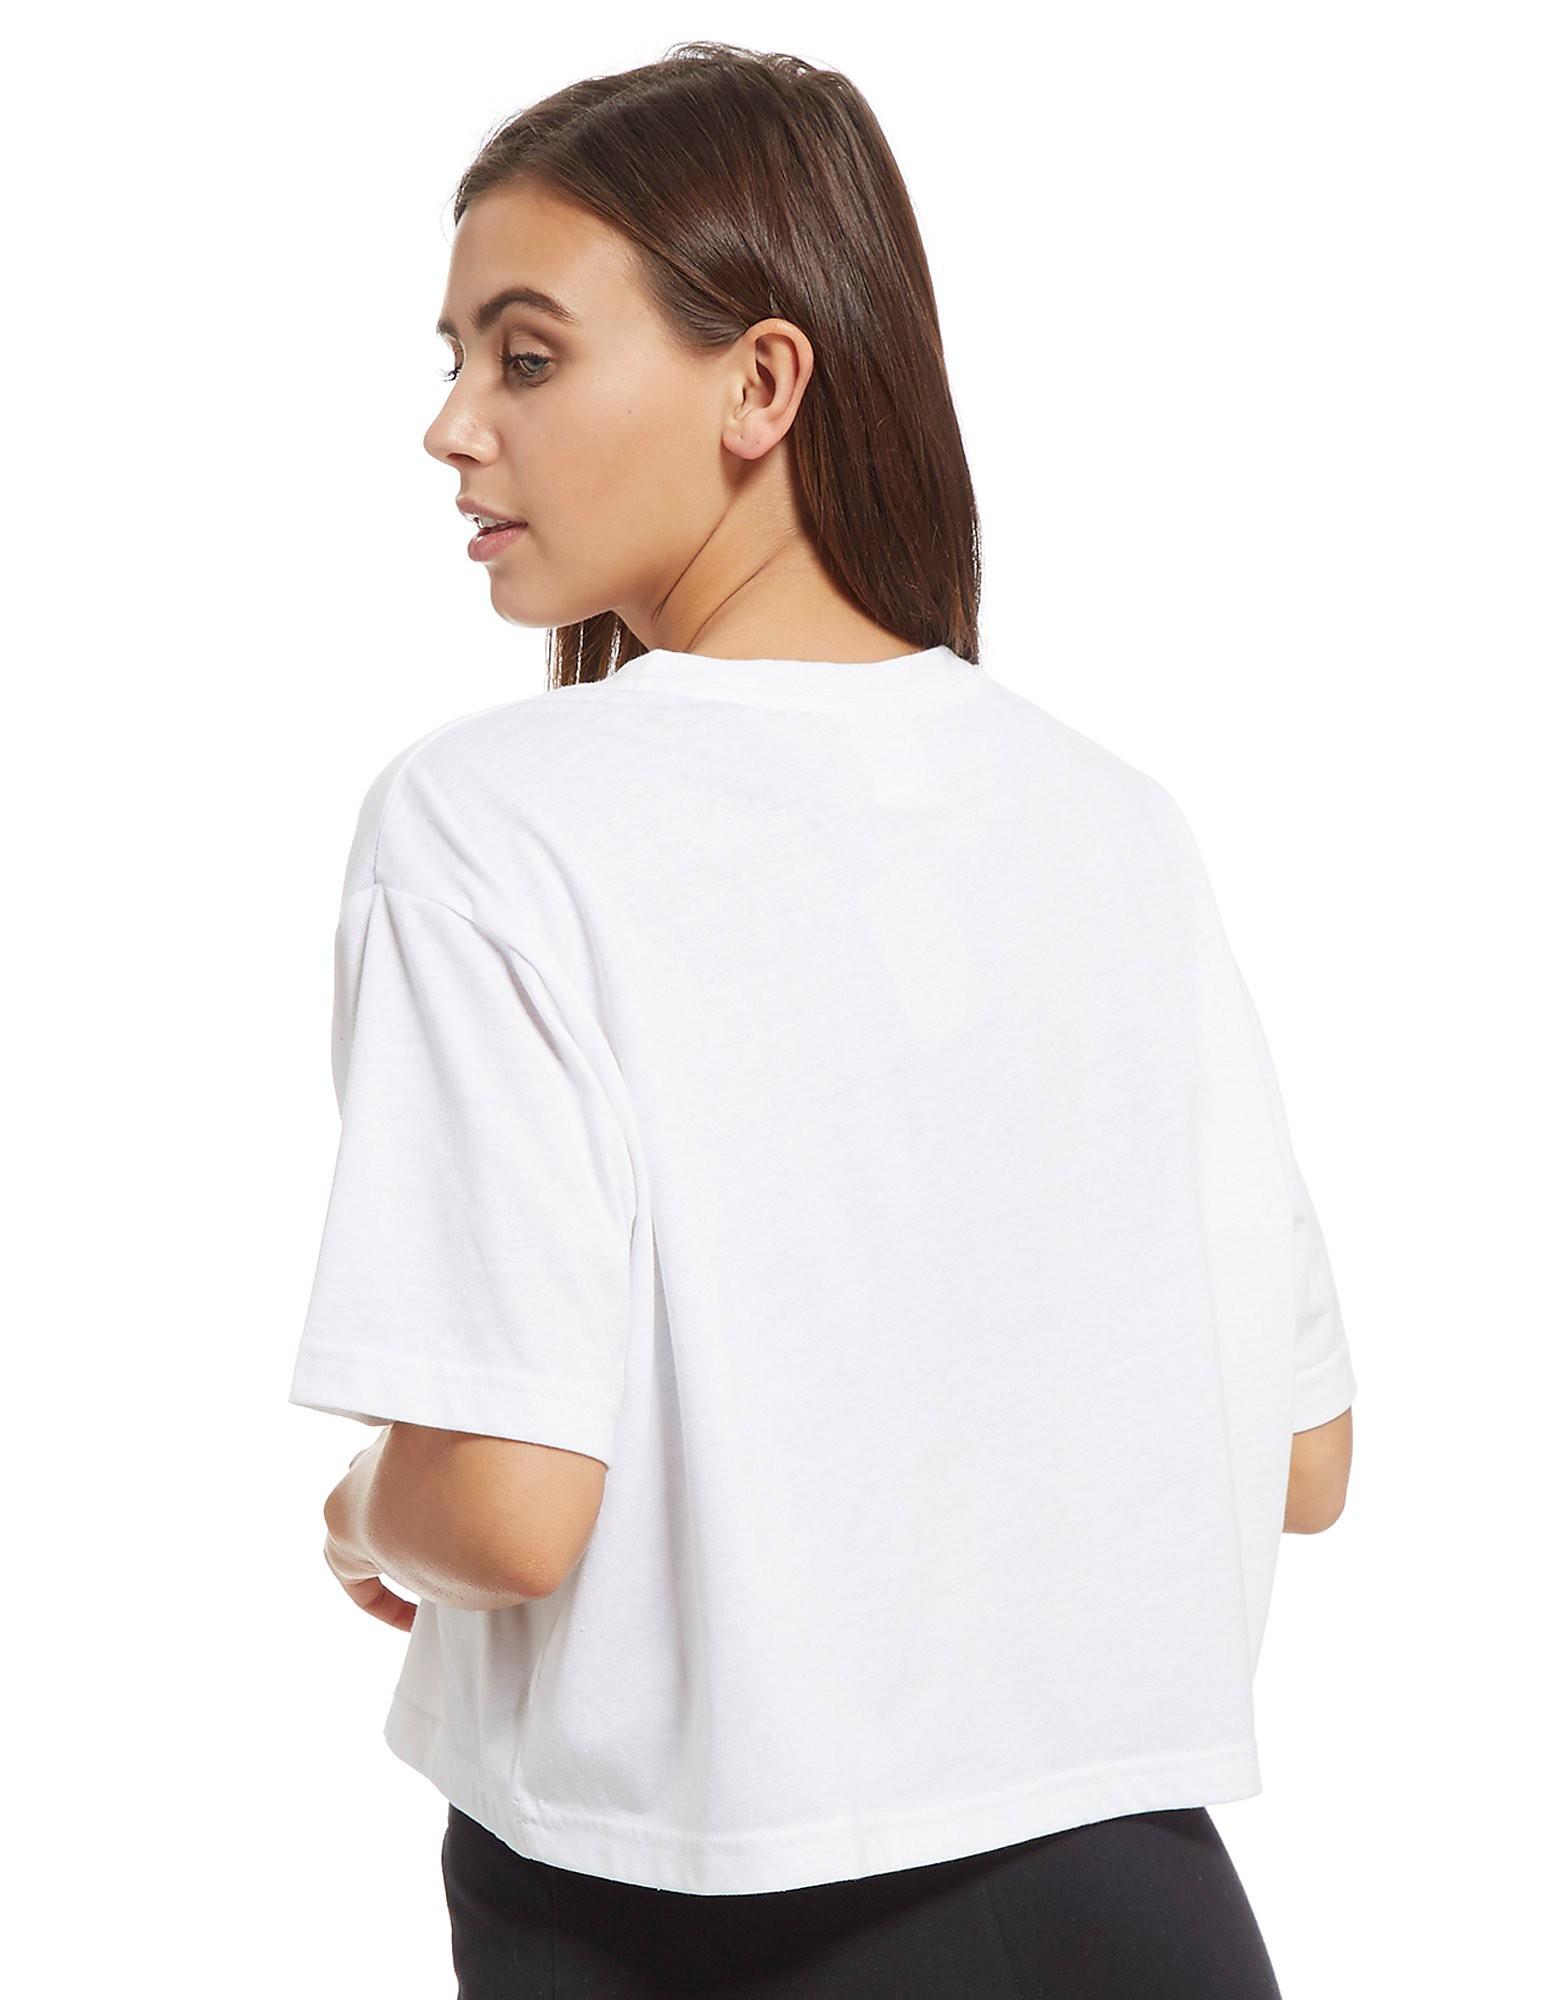 Reebok Classic Cropped T-Shirt Dames